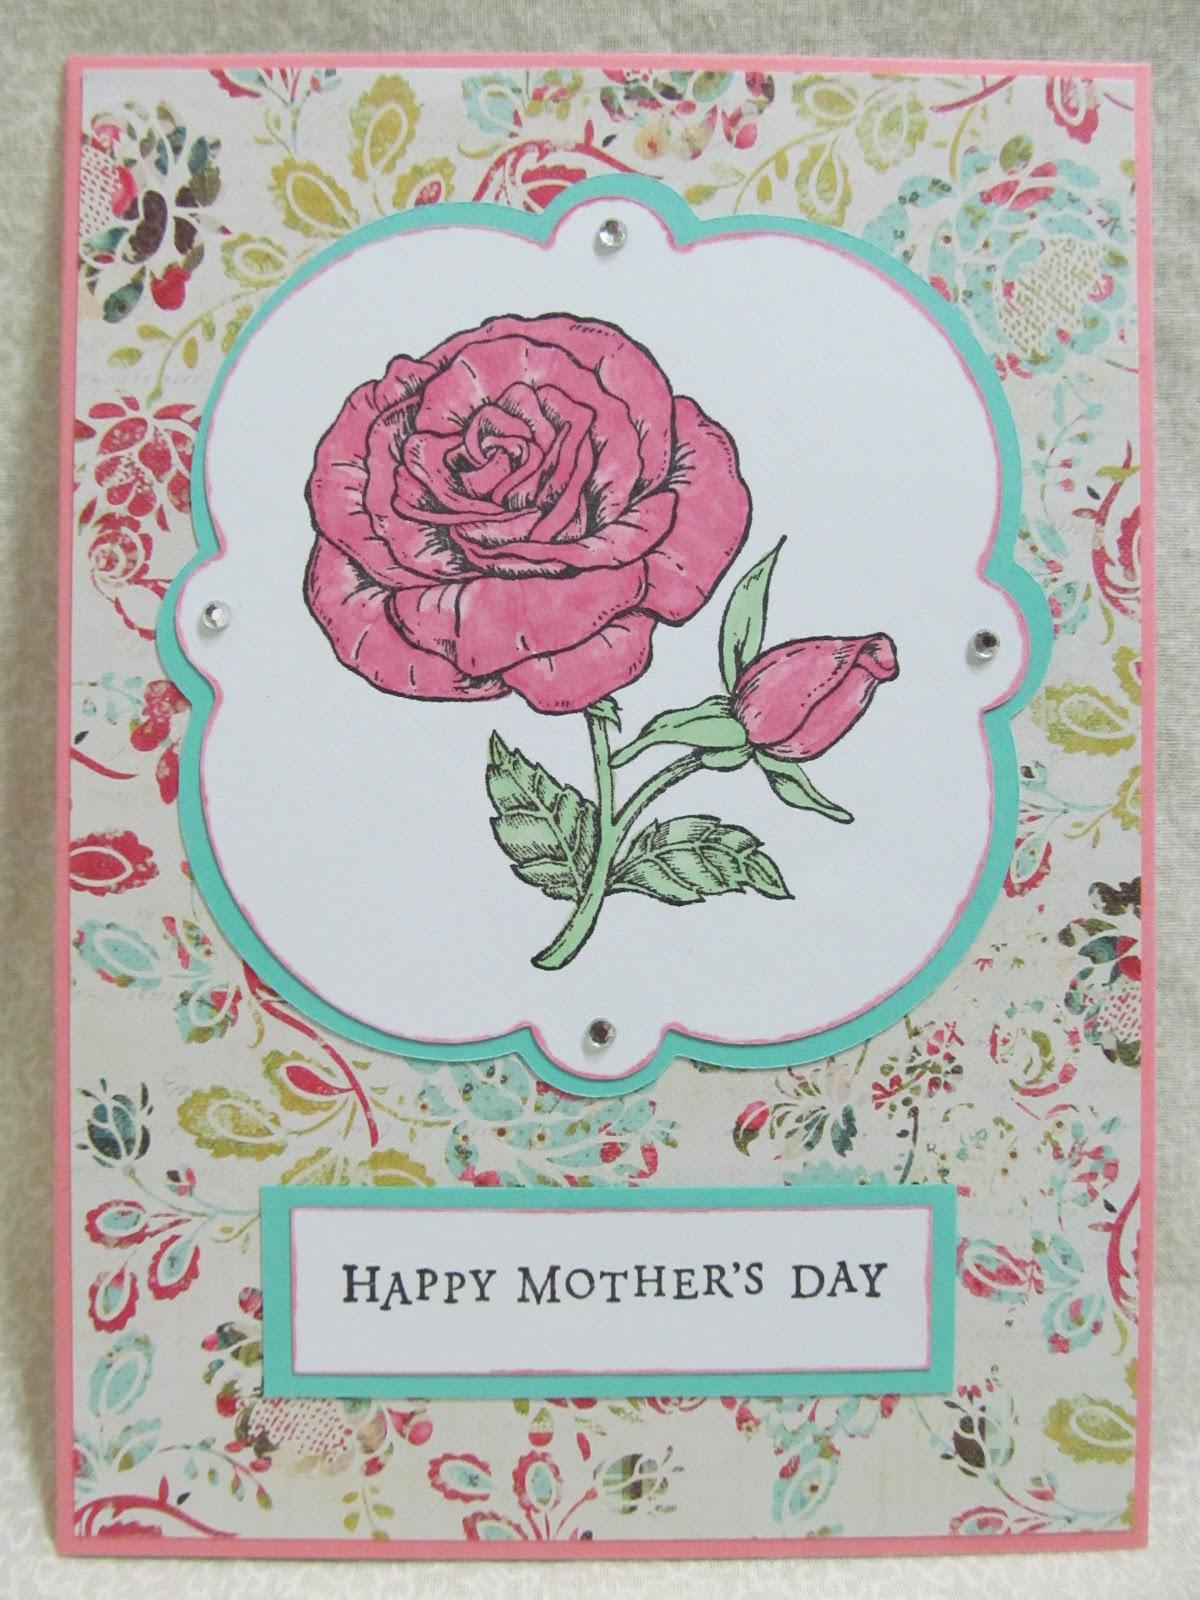 savvy handmade cards handmade mother's day card